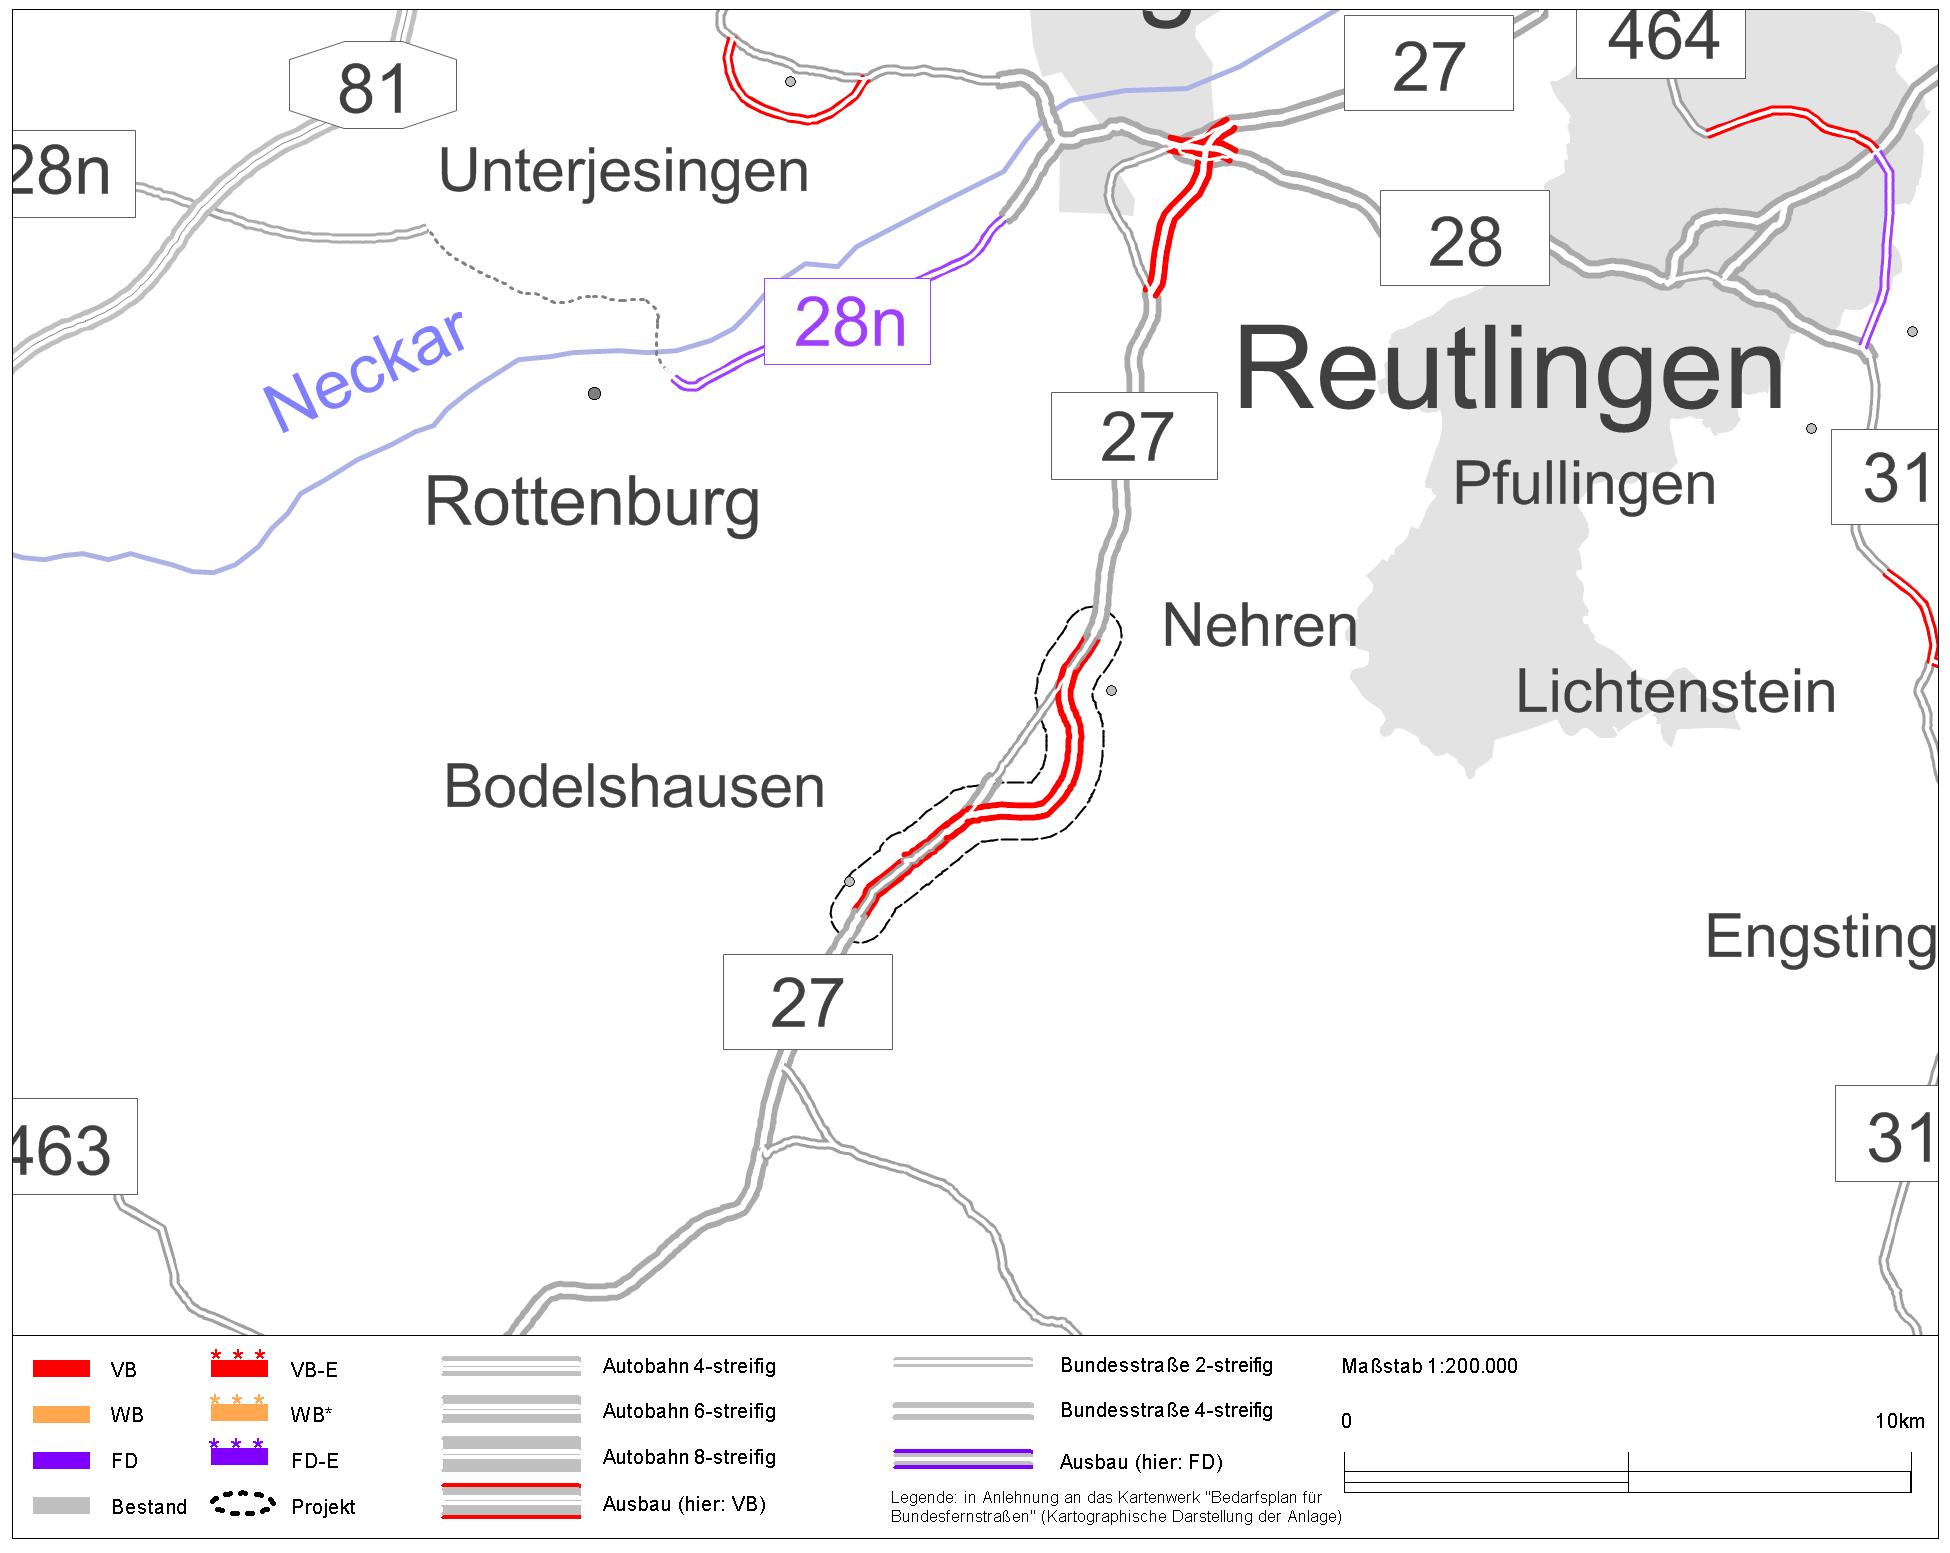 B 27 Bodelshausen (L 389) – Nehren (L 394) – Projektinformationssystem (PRINS) zum Bundesverkehrswegeplan 2030